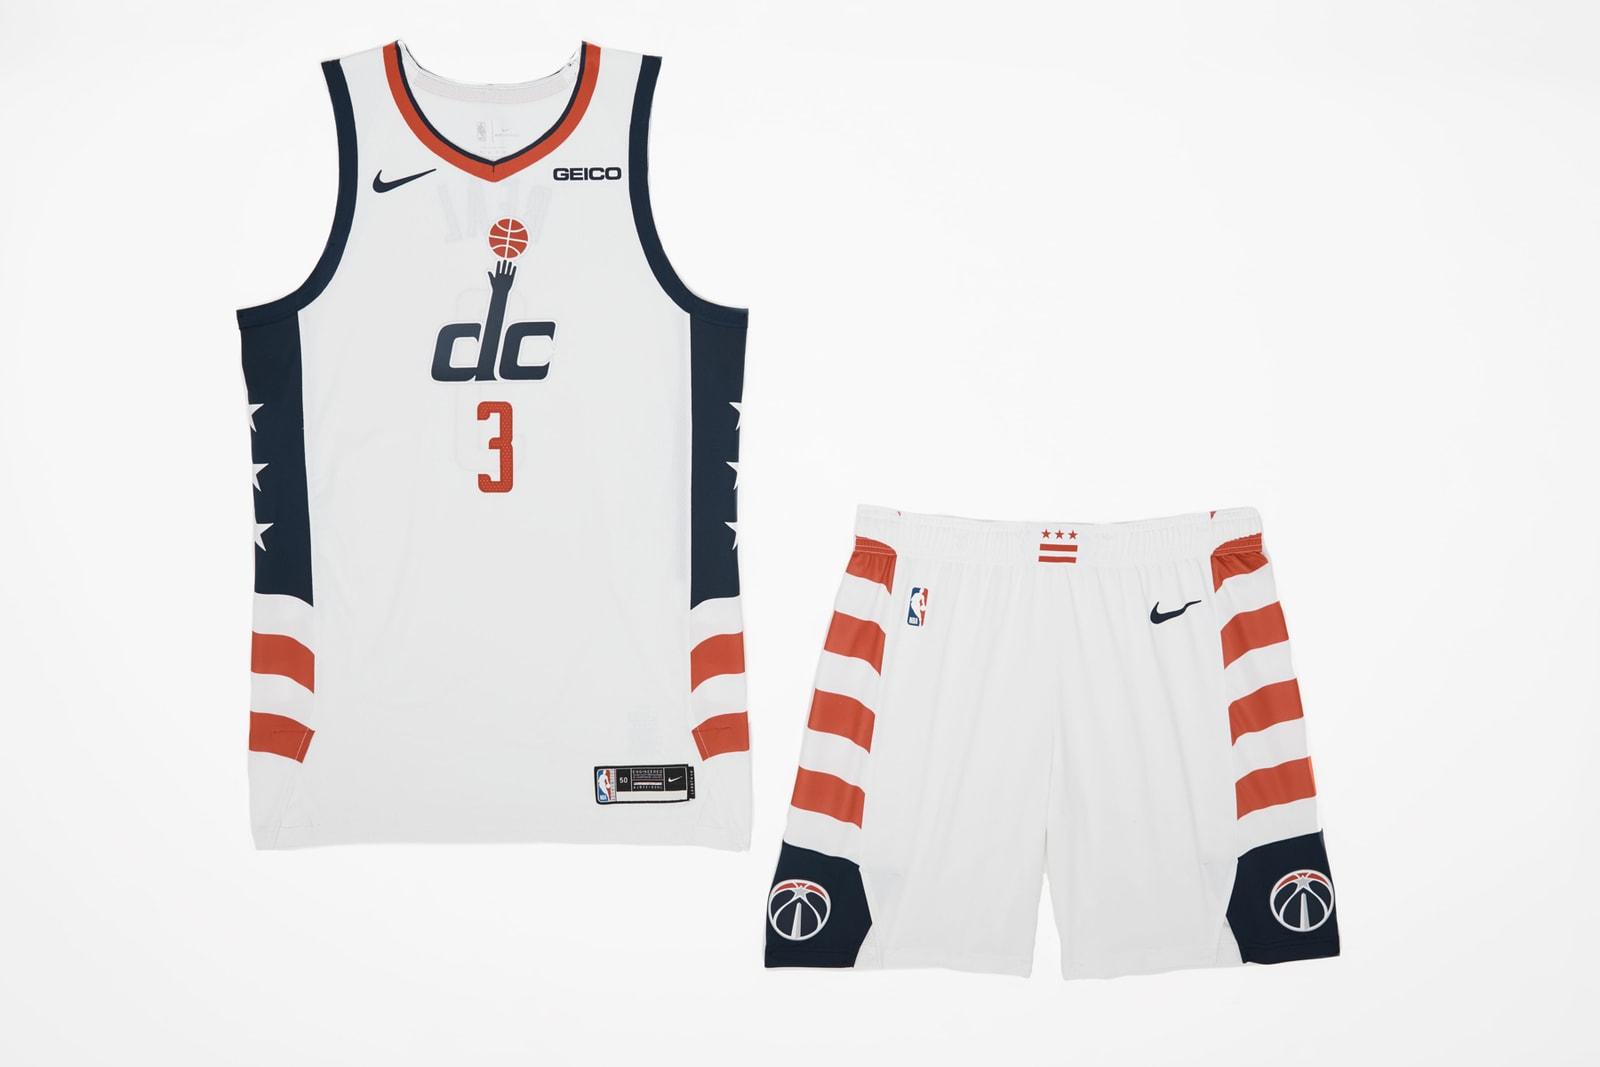 Nike Unveils 2019-20 NBA City Edition Jerseys basketball Chicago bulls toronto raptors golden state warriors Detroit pistons